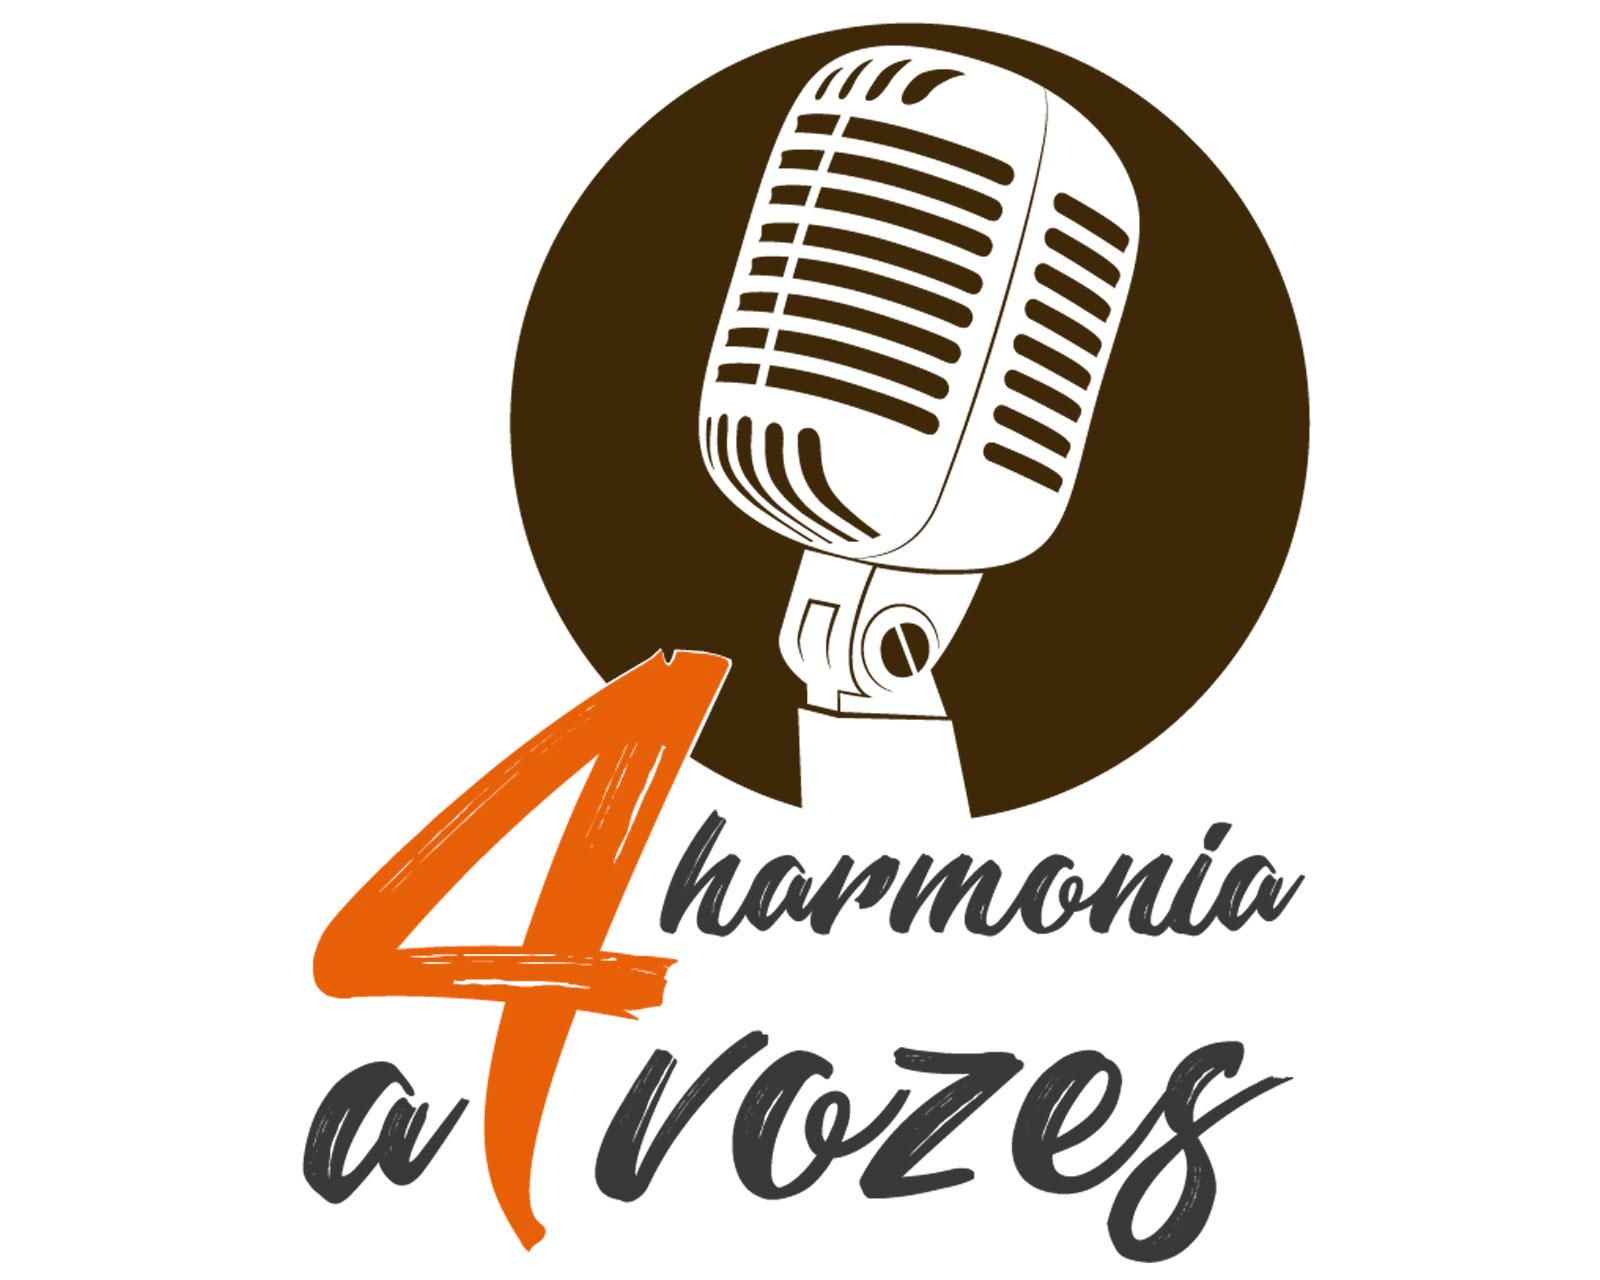 LOGOMARCA HARMONIA A 4 VOZES